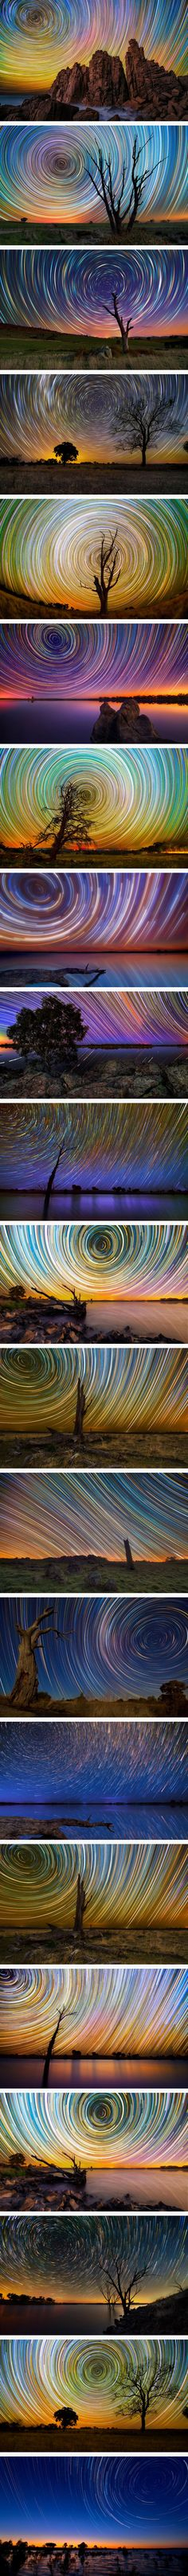 Nikon D3100 Photo by Lincoln Harrison near Lake Eppalok